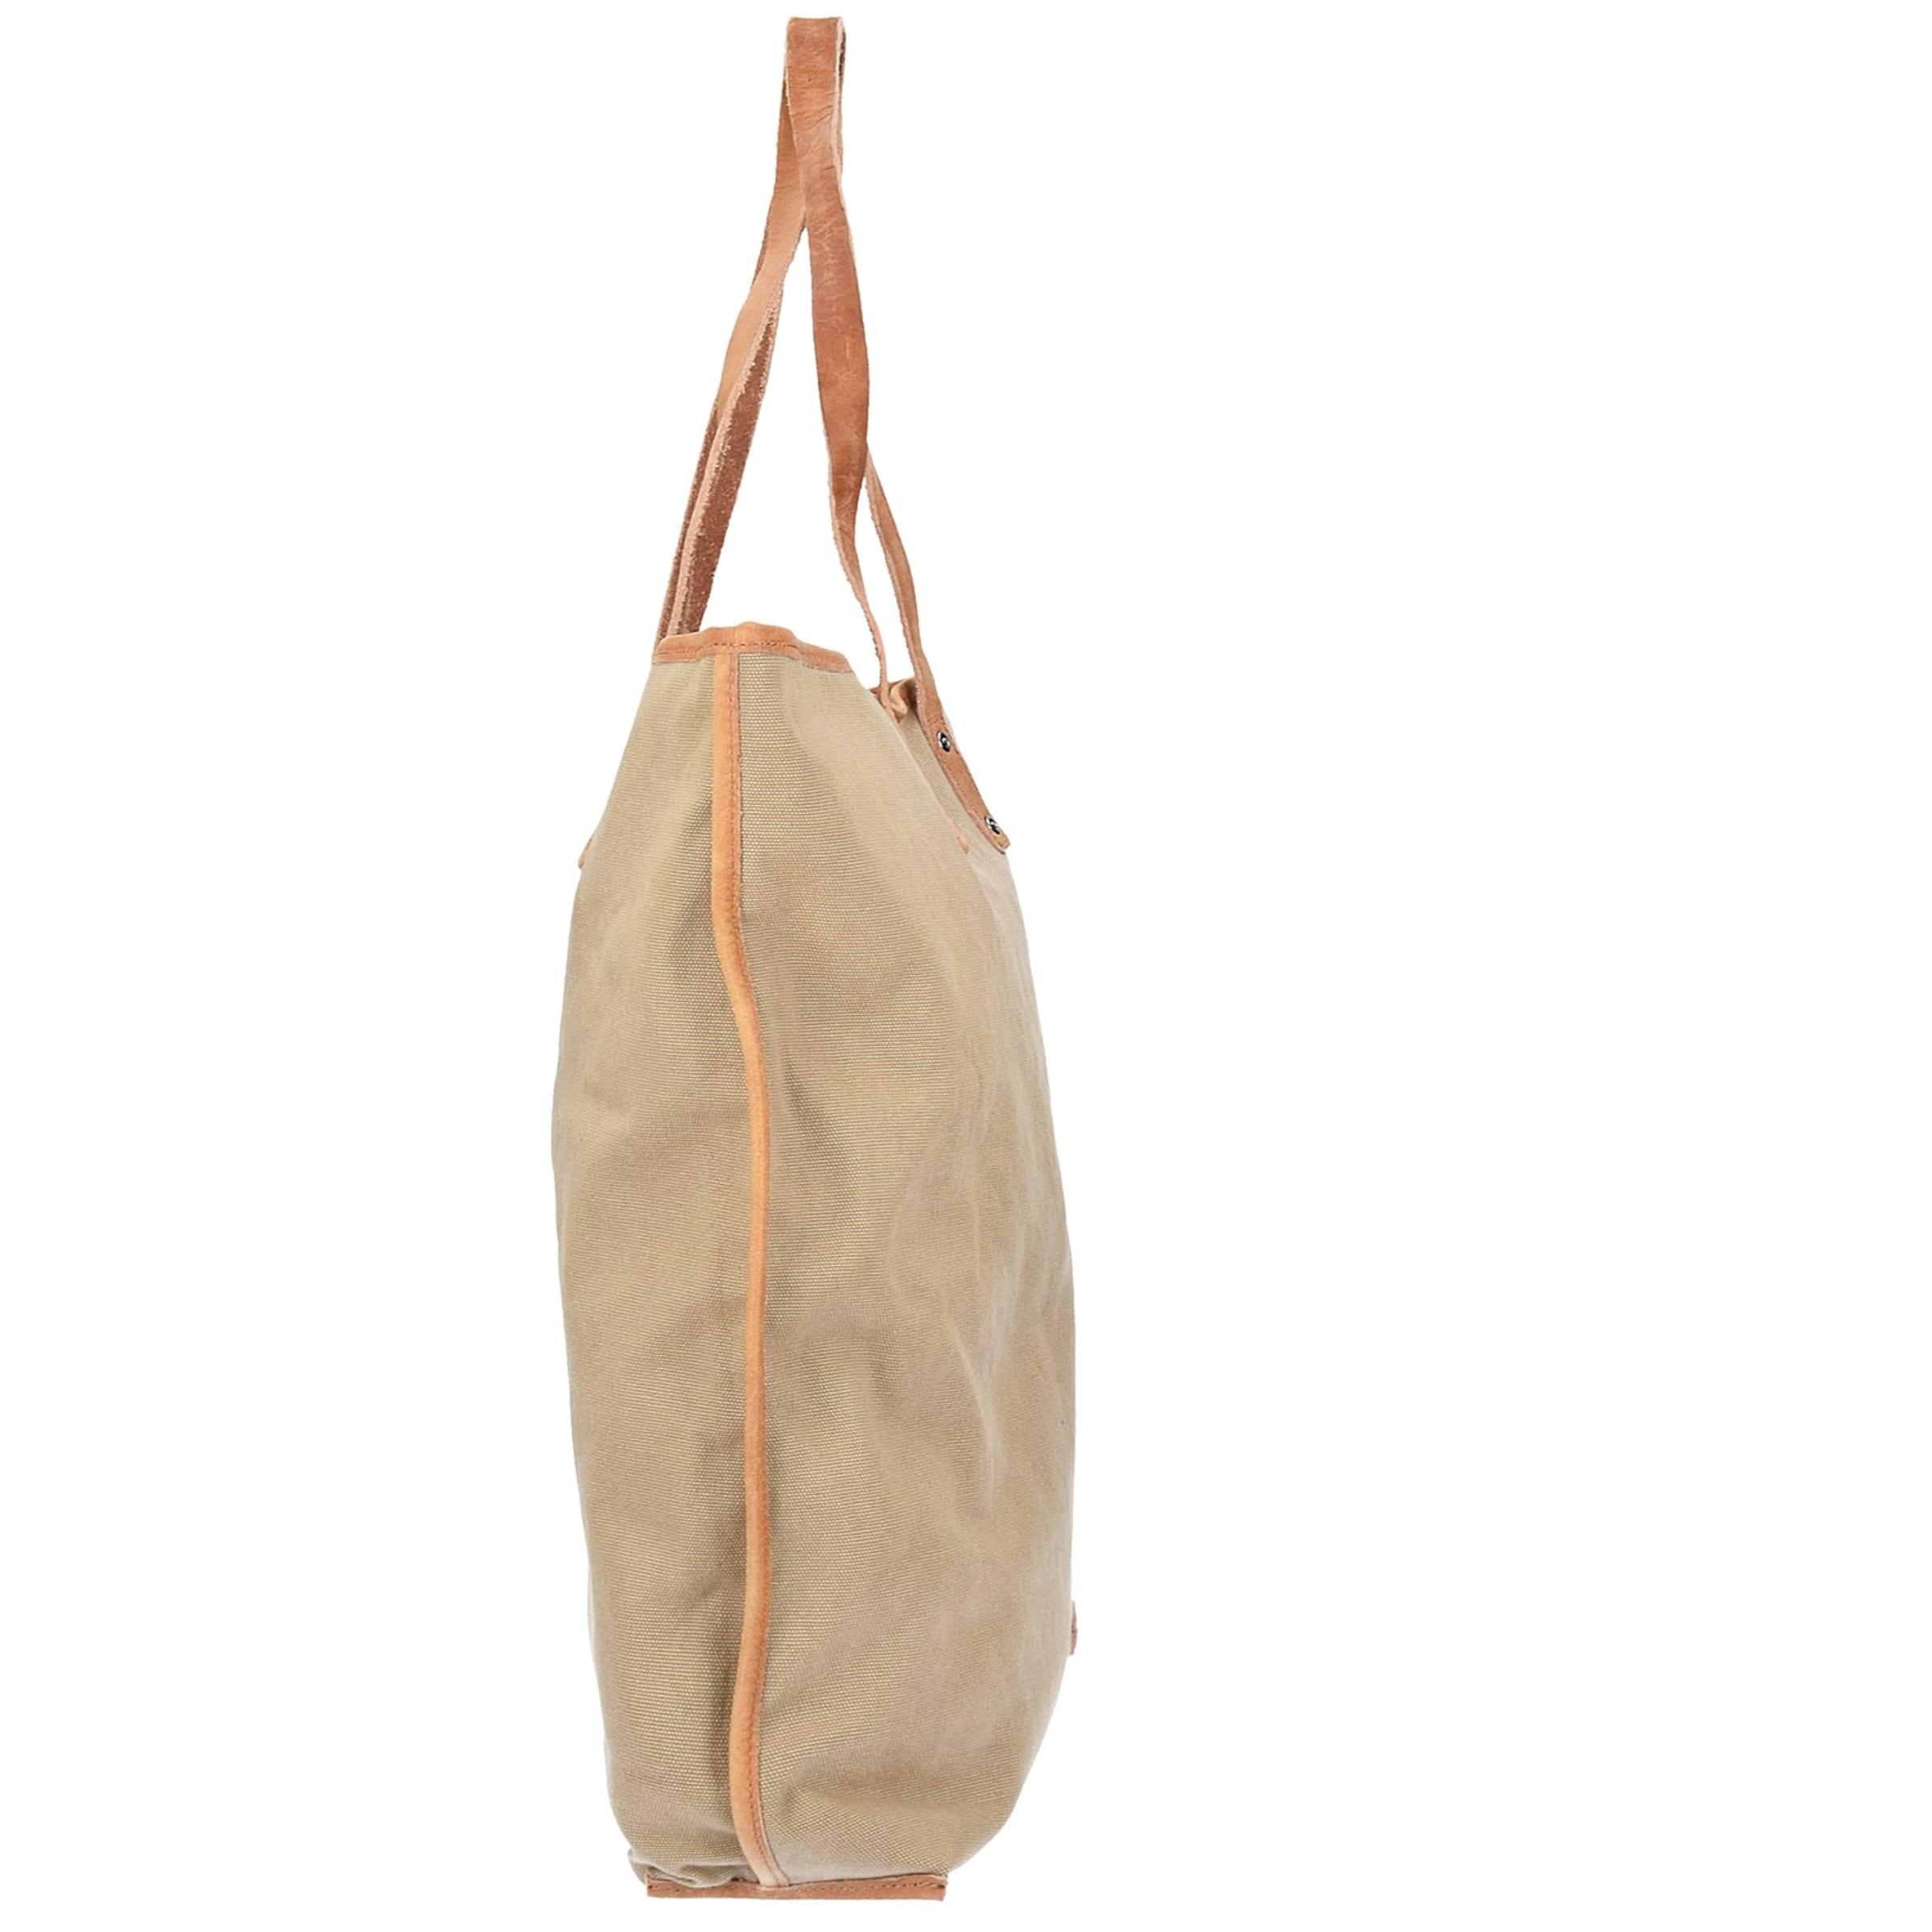 ESPRIT Deborah Shopper Tasche 40 cm Factory-Outlet-Online Billig Authentisch Auslass j6Z2LIc6SB